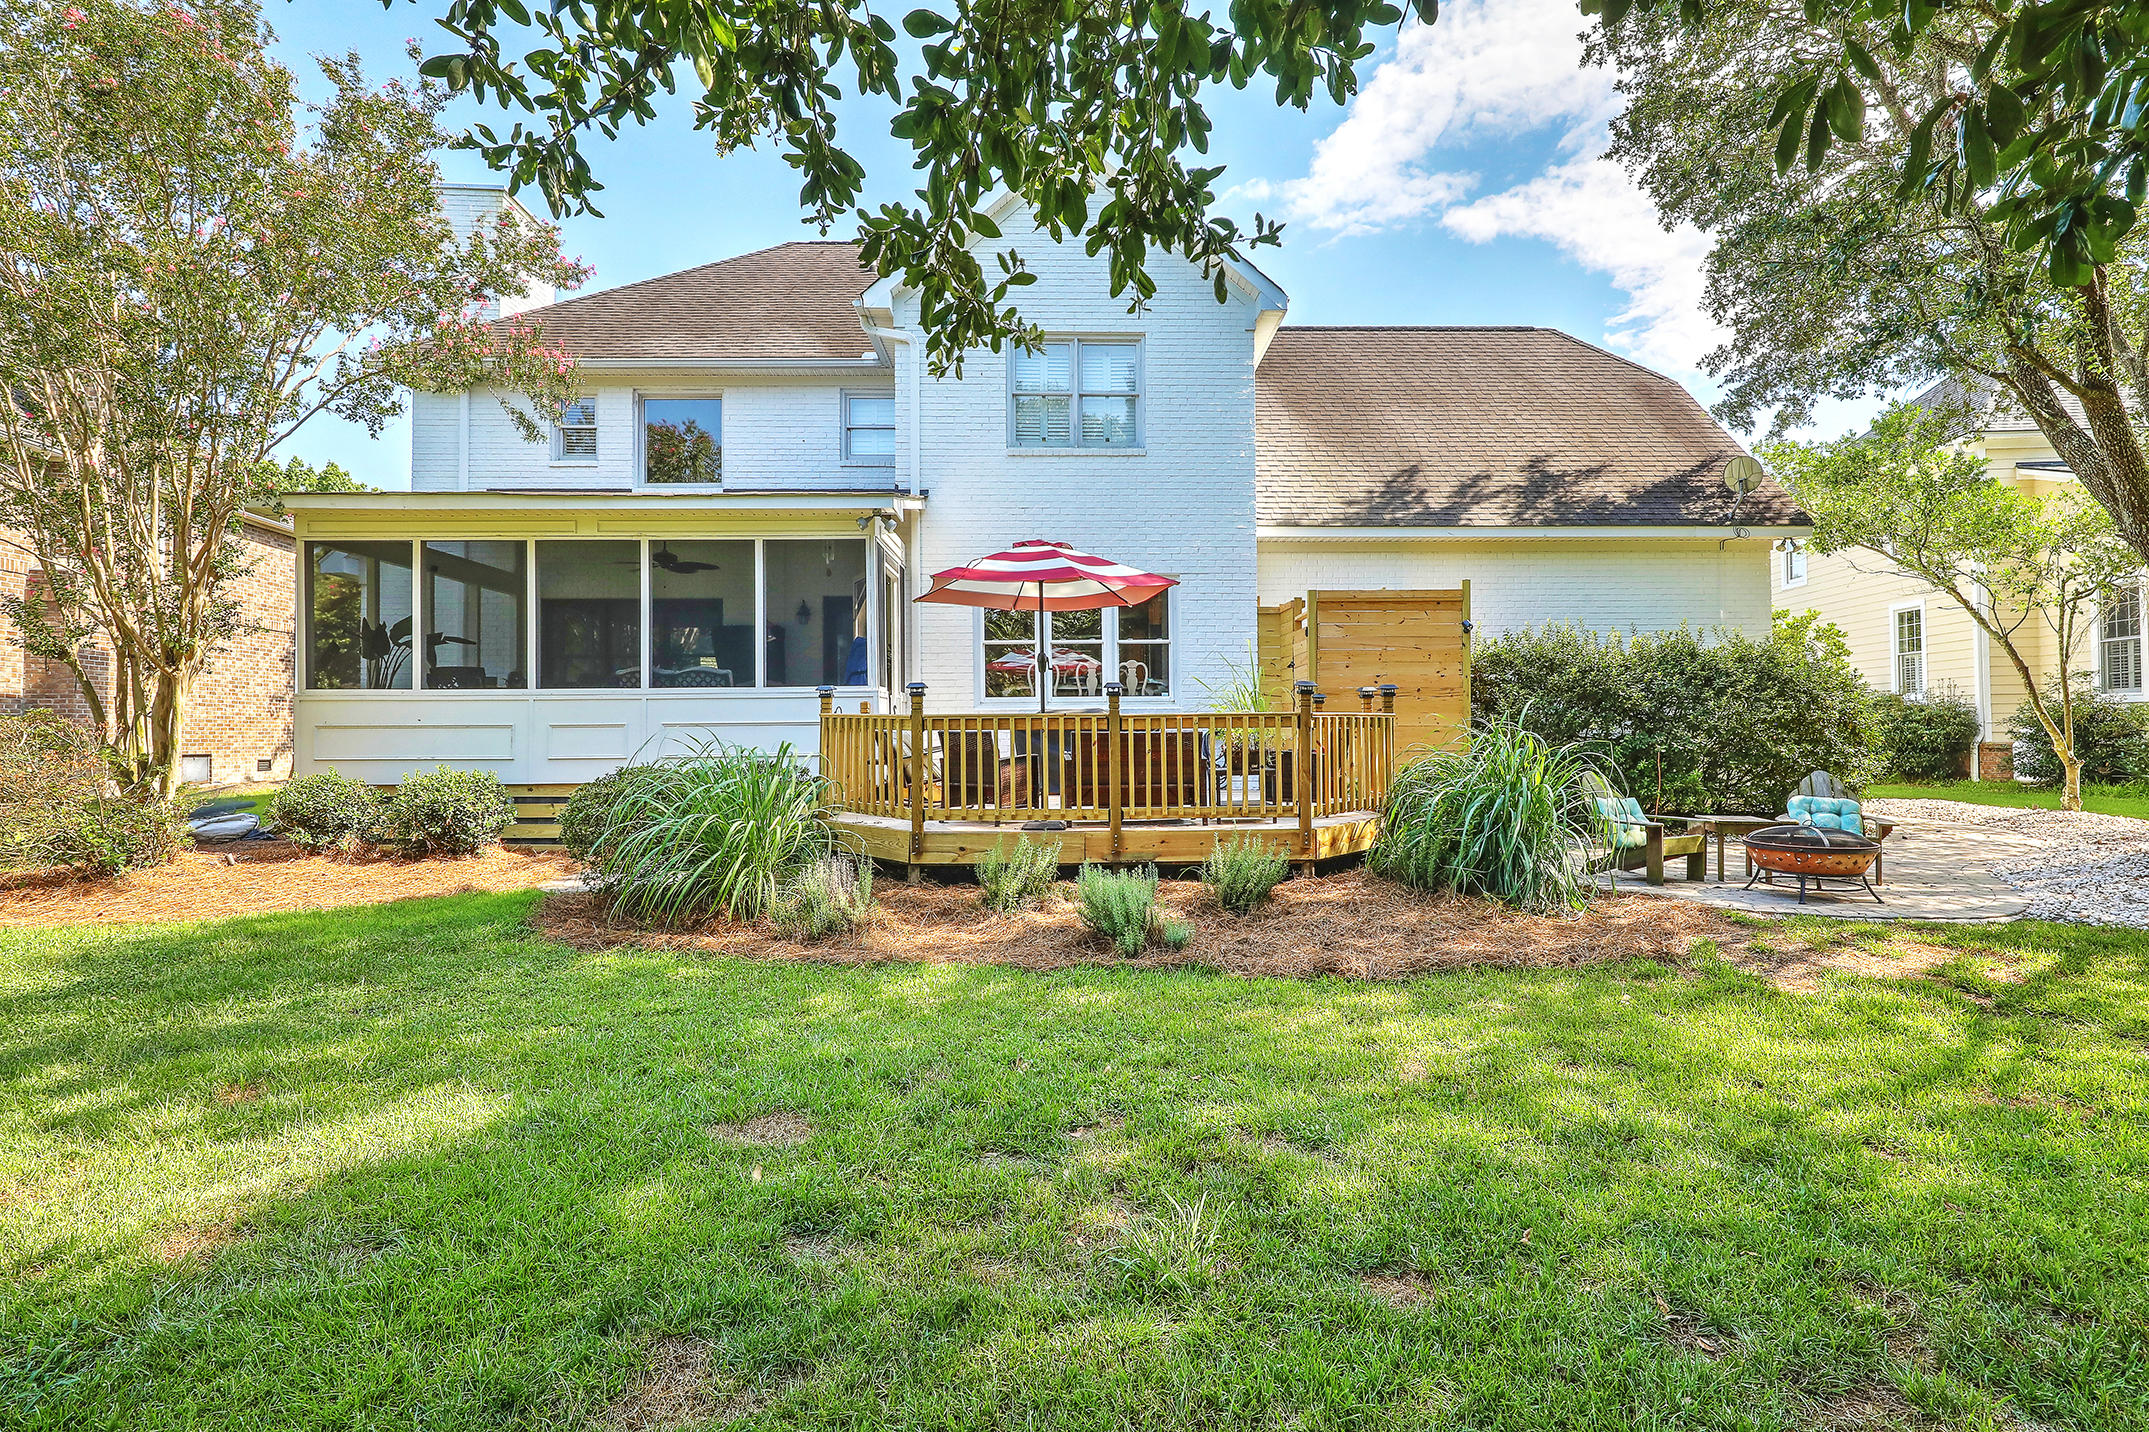 Hobcaw Creek Plantation Homes For Sale - 619 Palisades, Mount Pleasant, SC - 71